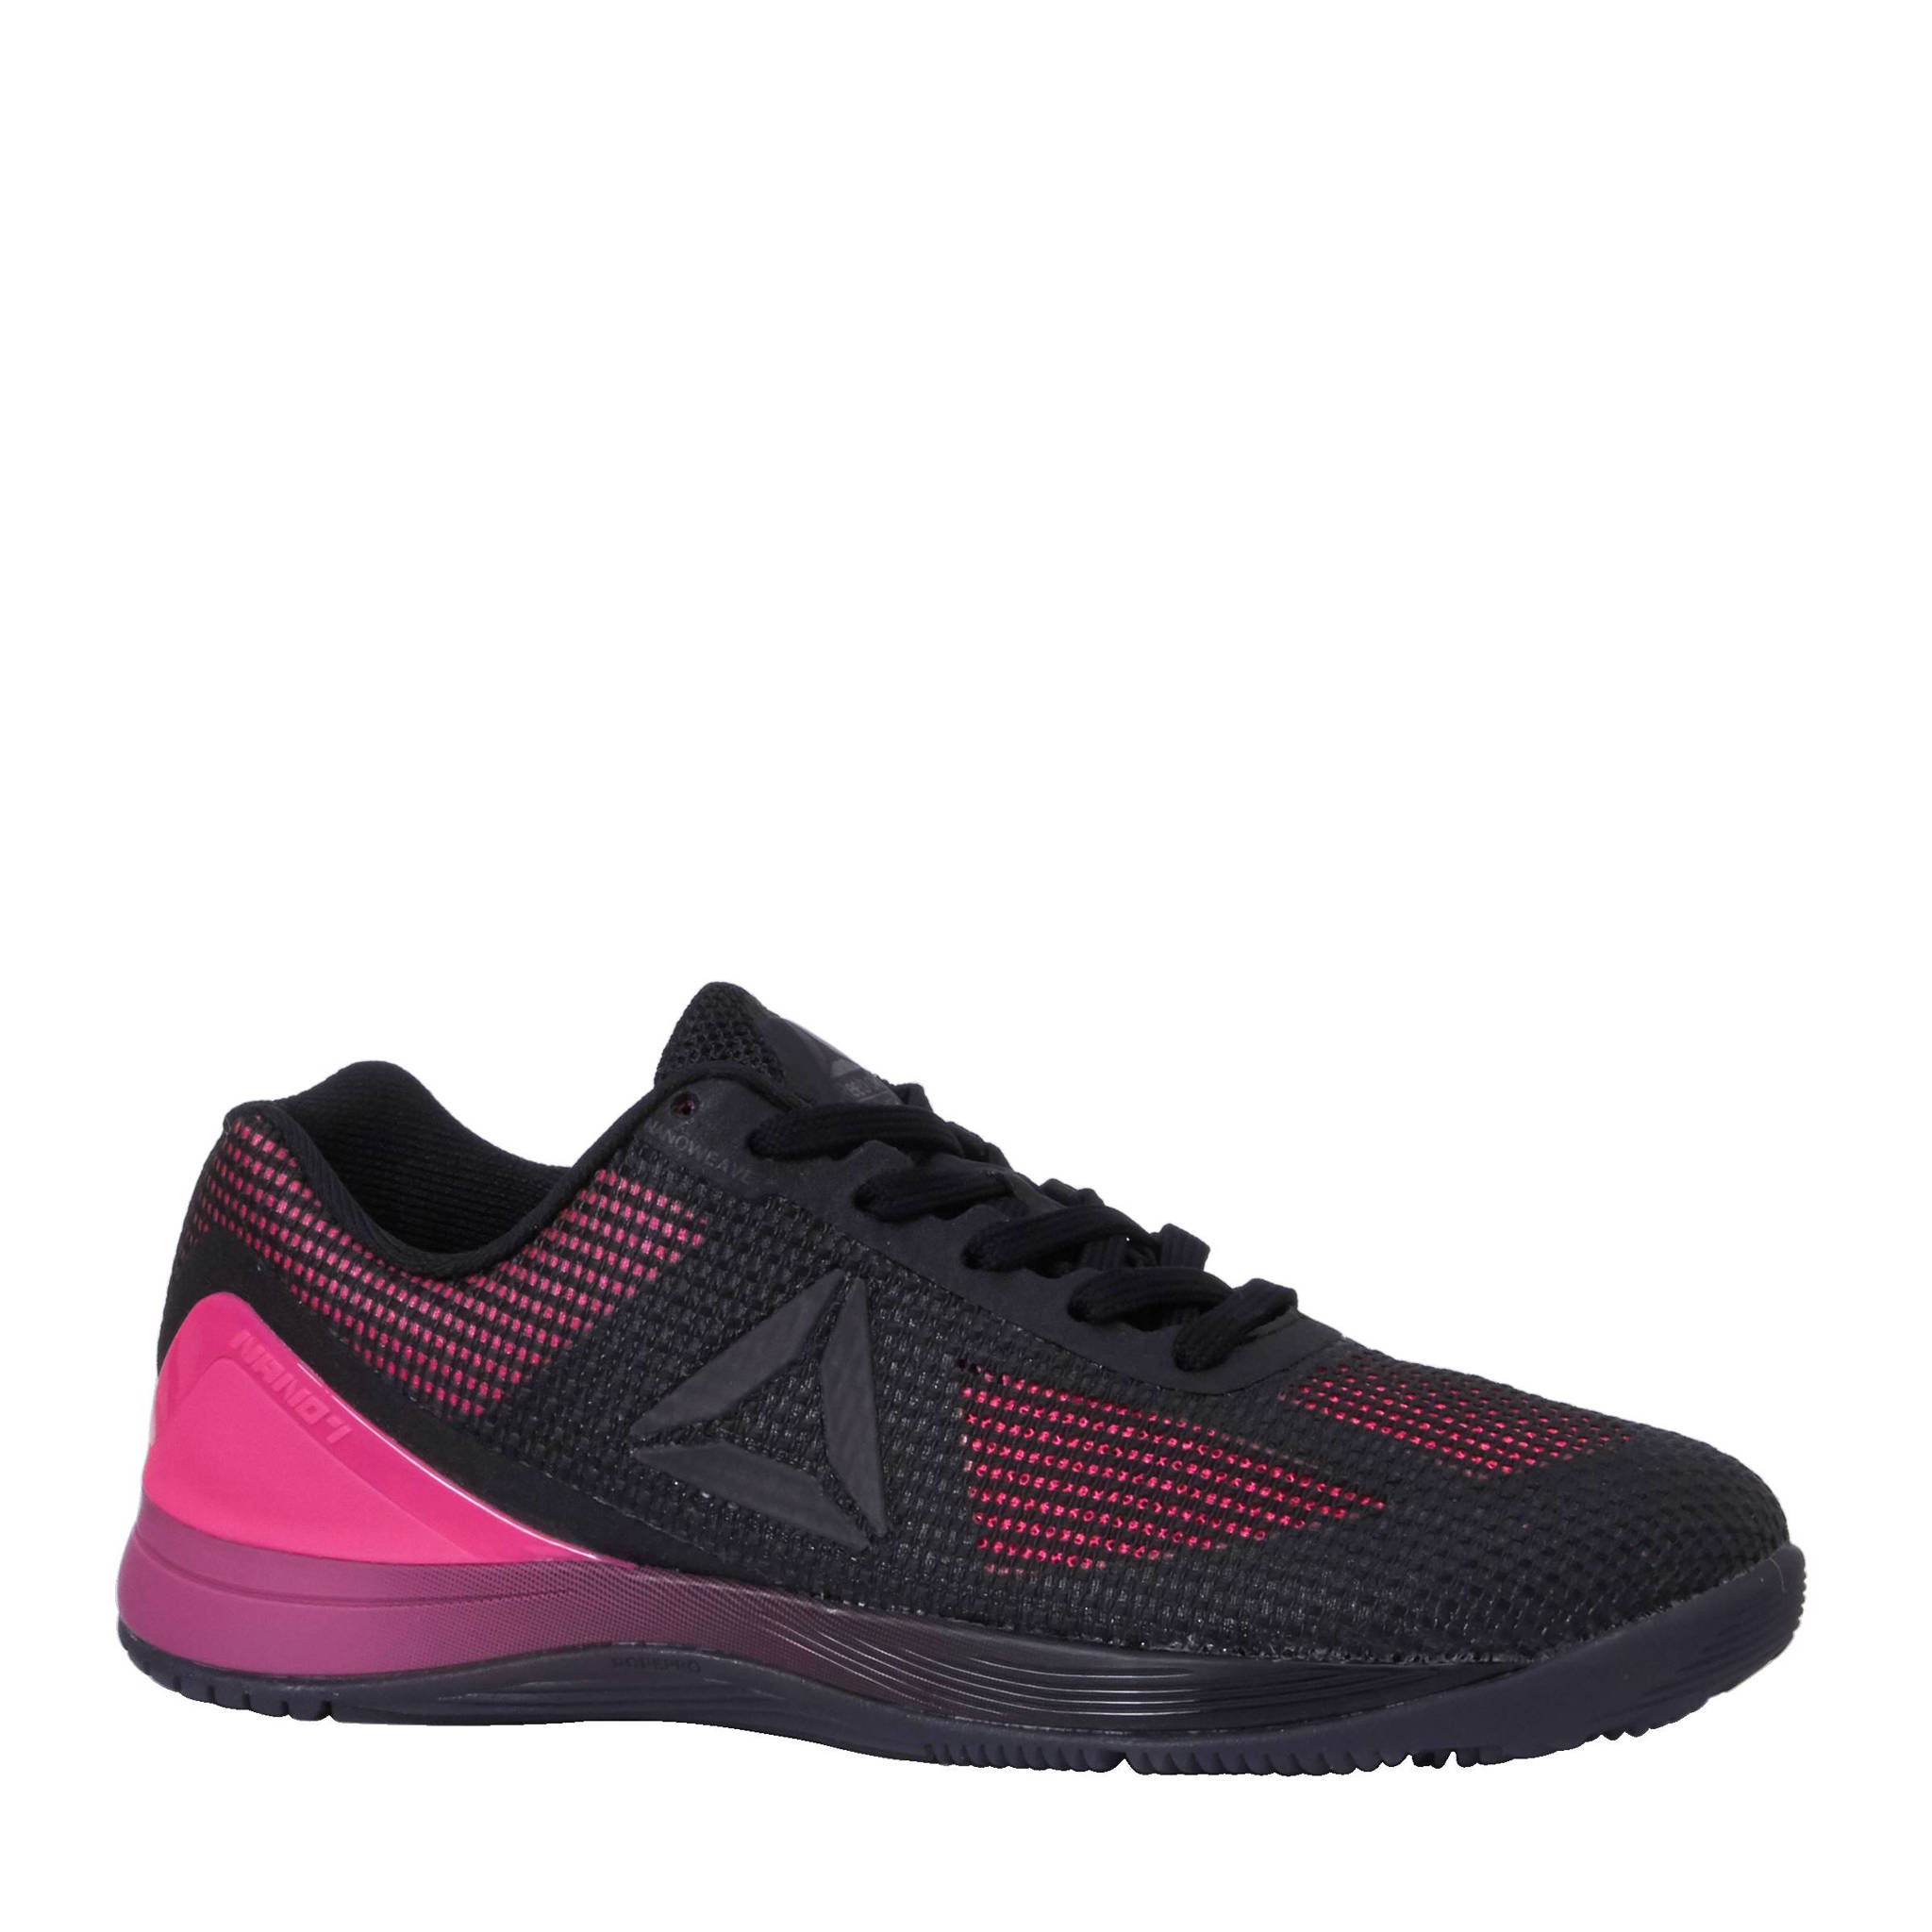 a5d98ec2803 Reebok CrossFit Nano 7.0 fitness schoenen | wehkamp